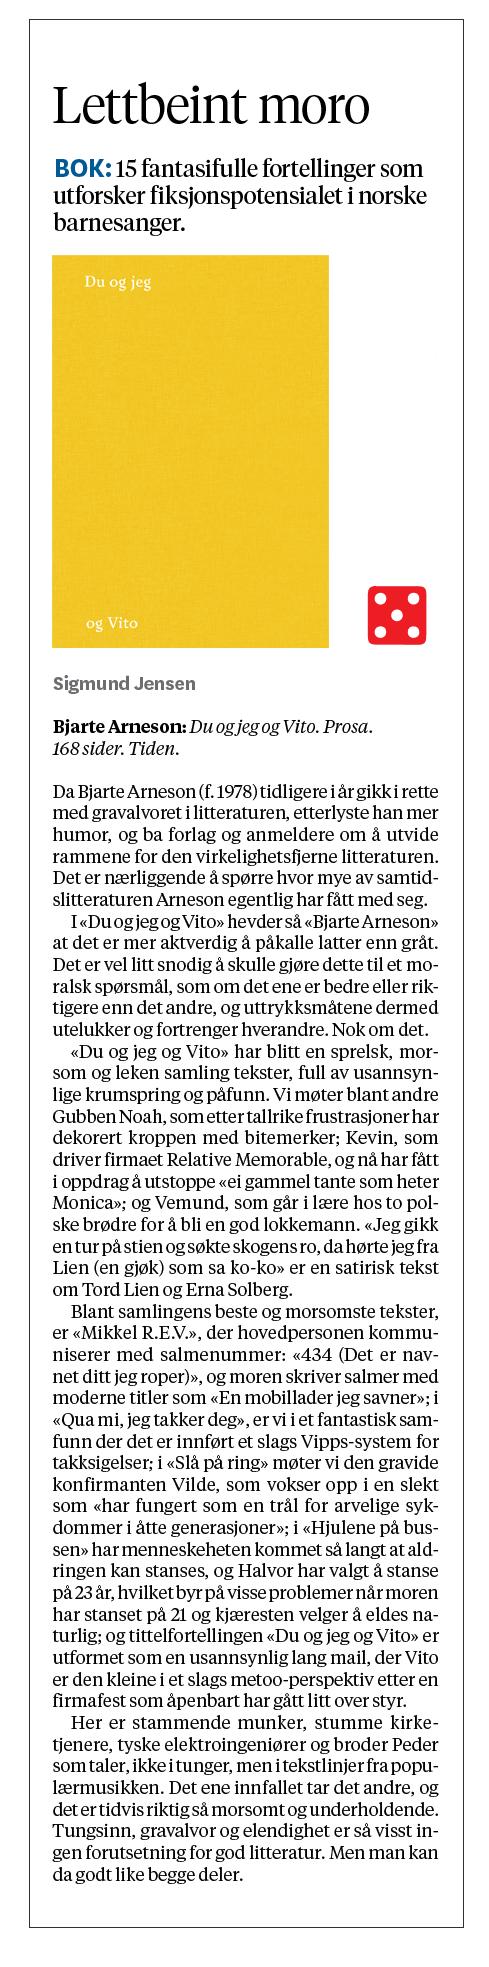 vito_aftenbladet.jpg